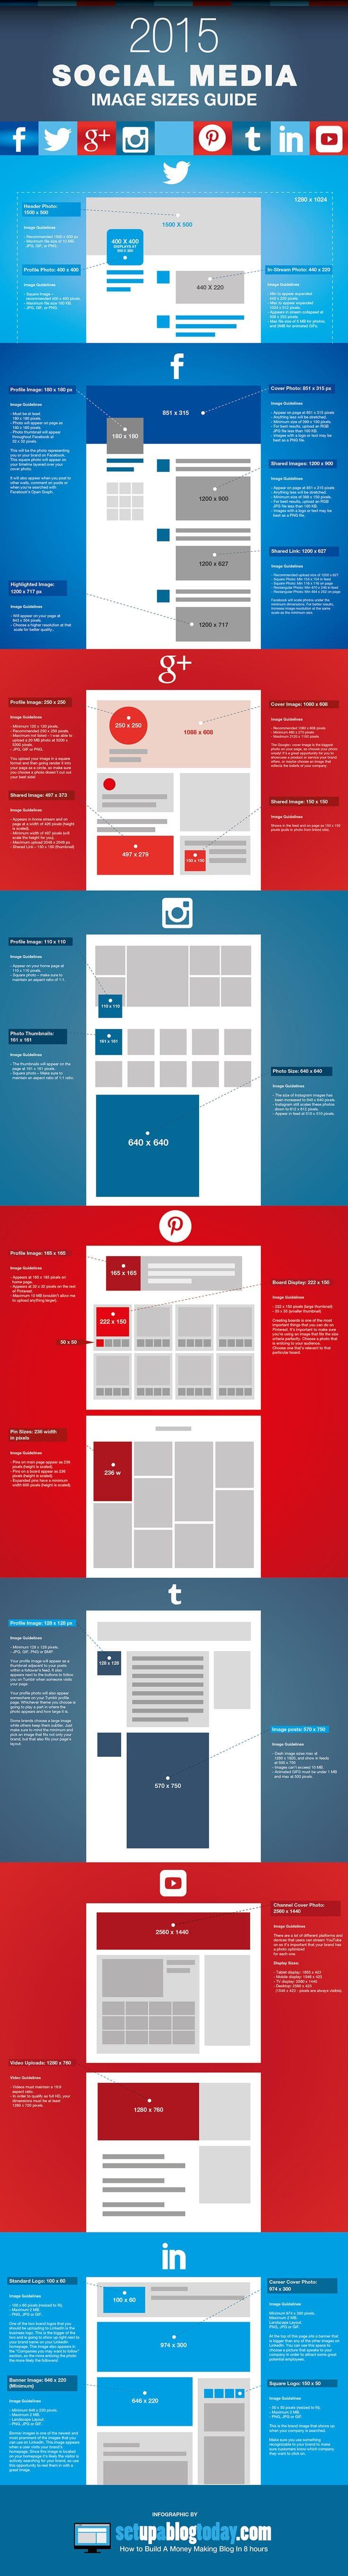 ghid dimensiuni imagini in social media